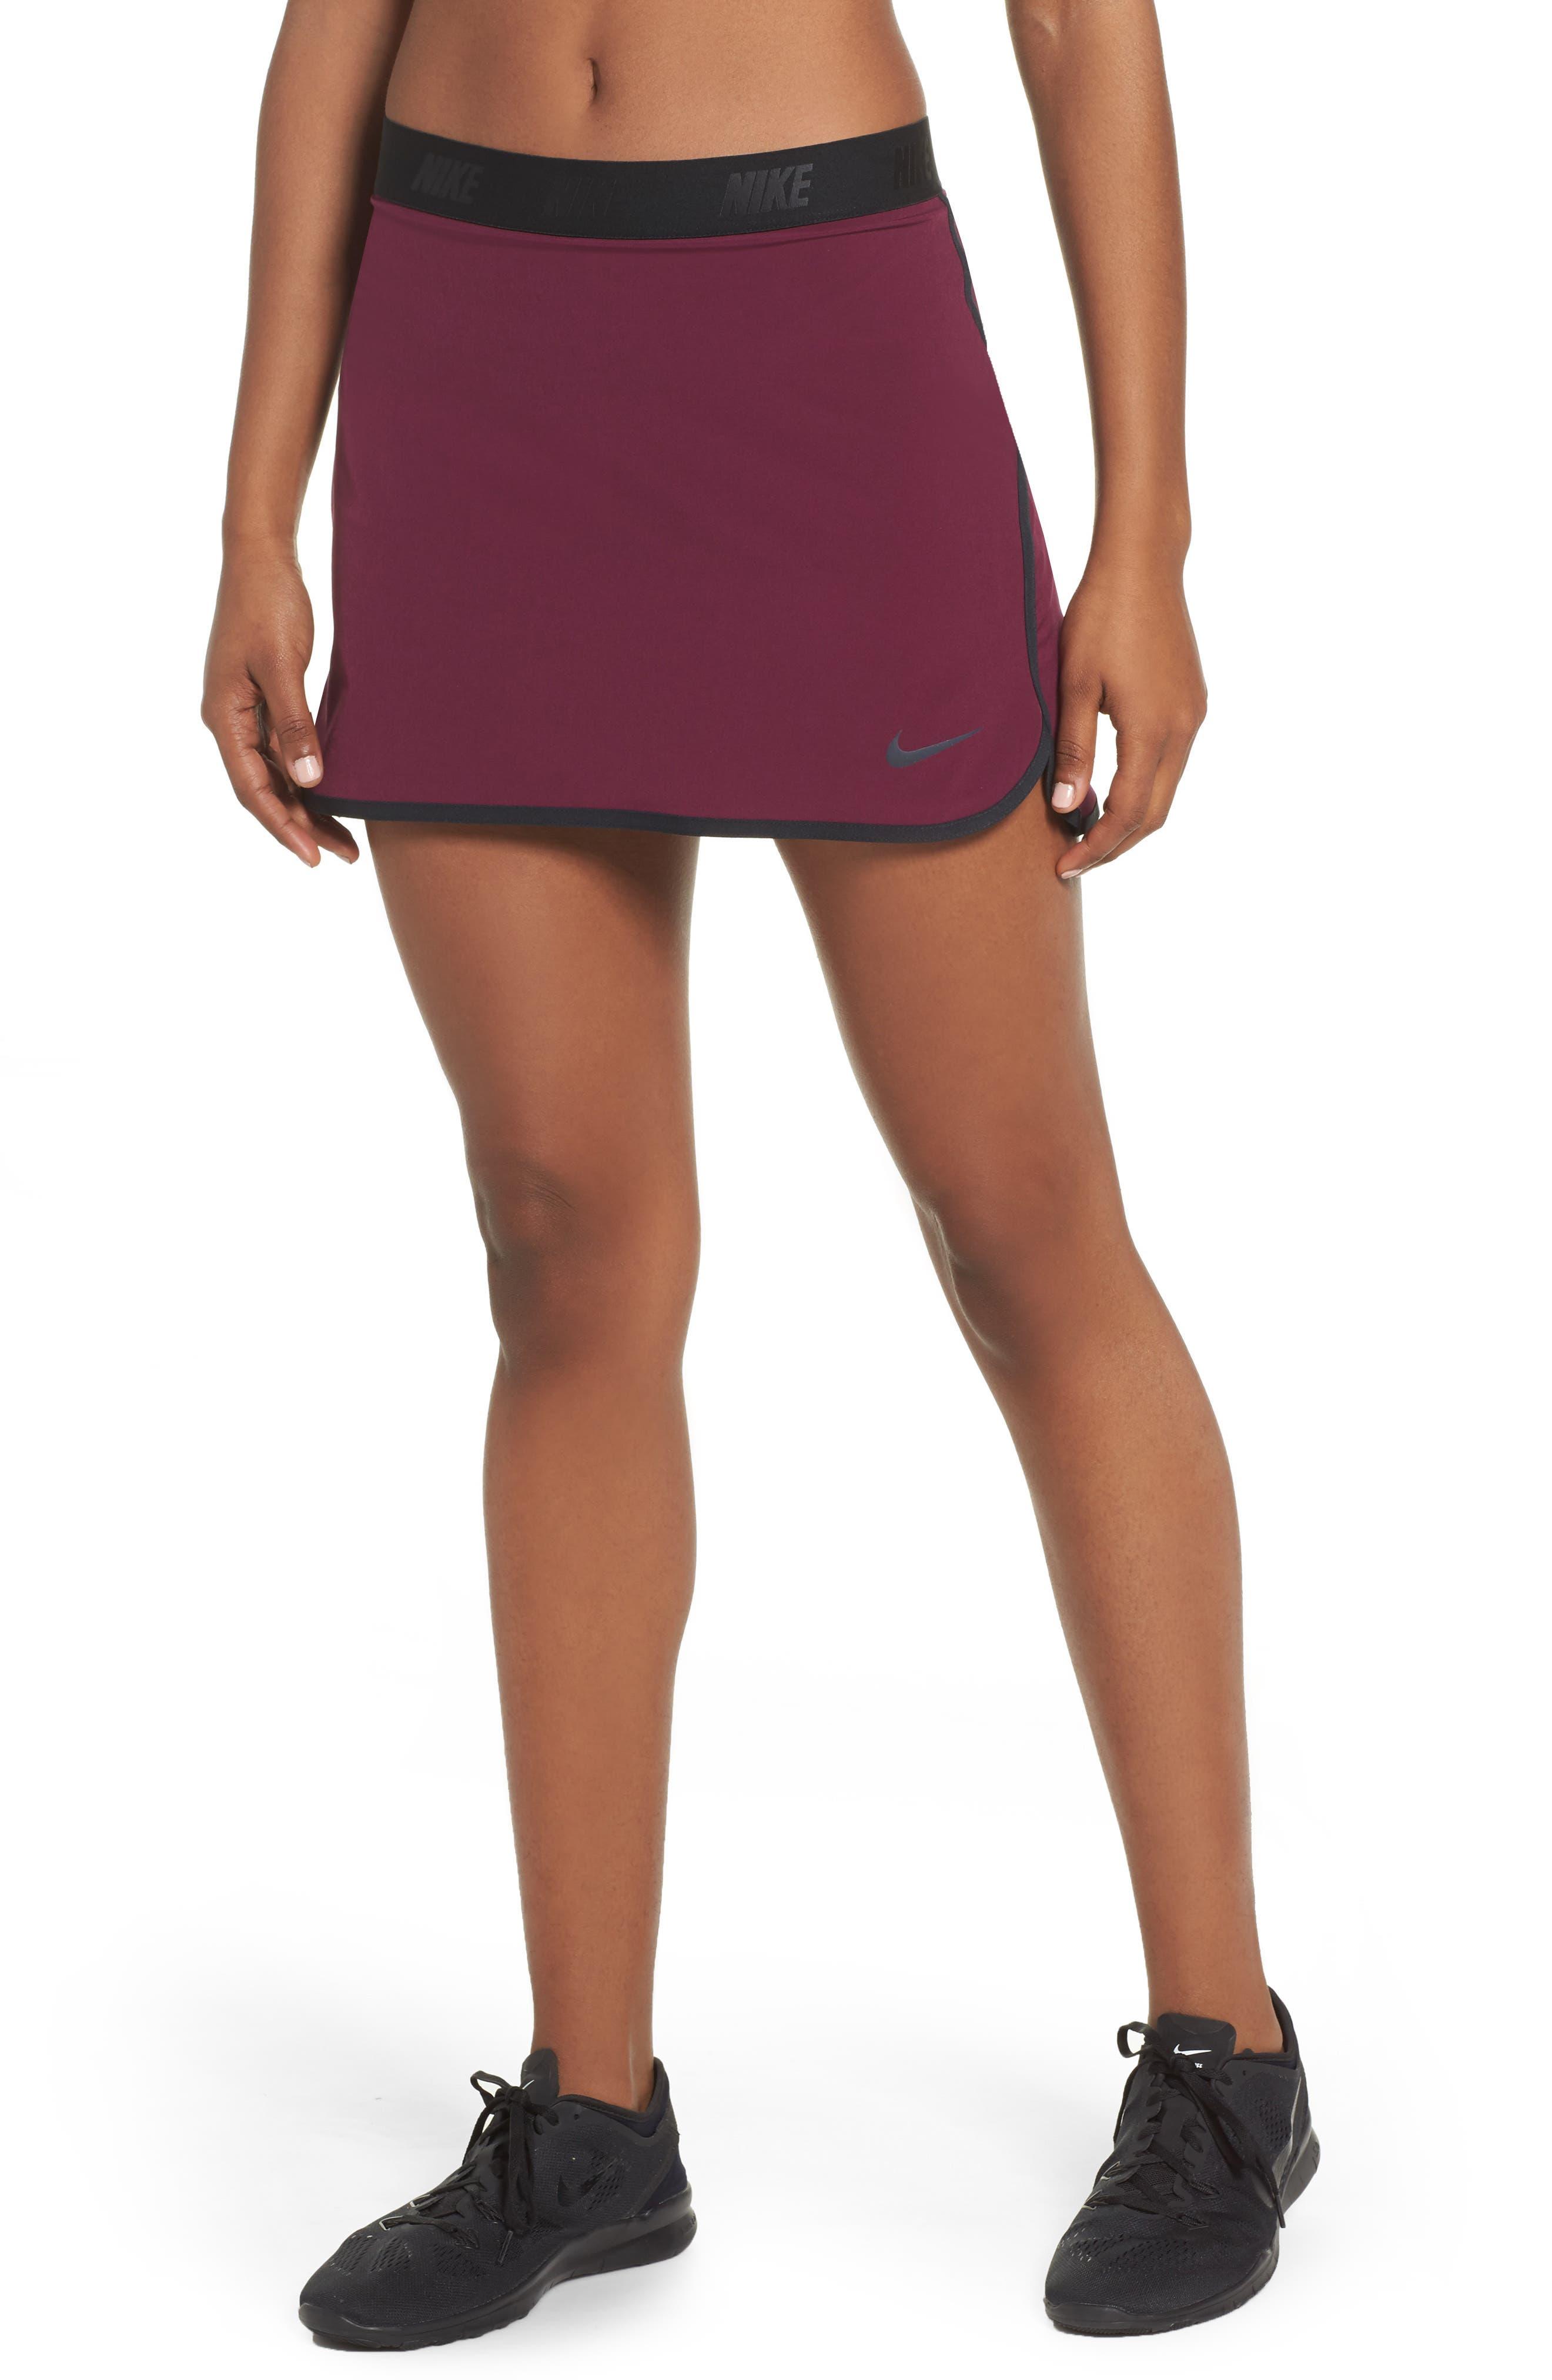 Flex Tennis Skirt,                             Main thumbnail 1, color,                             930